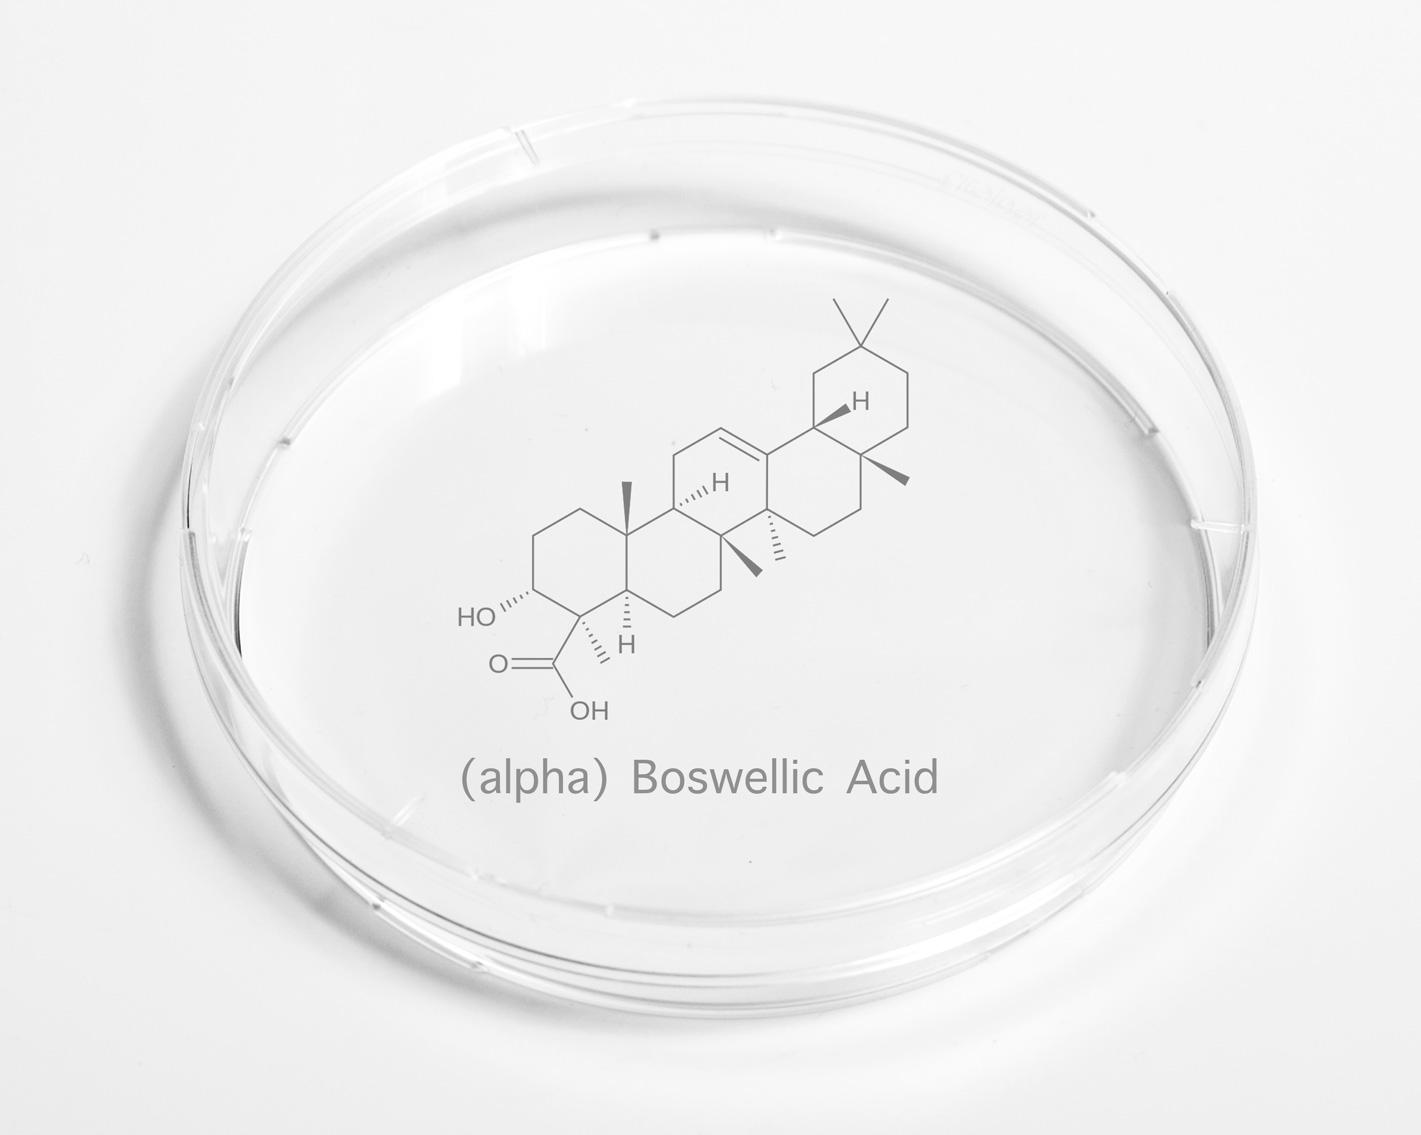 boswellicacid